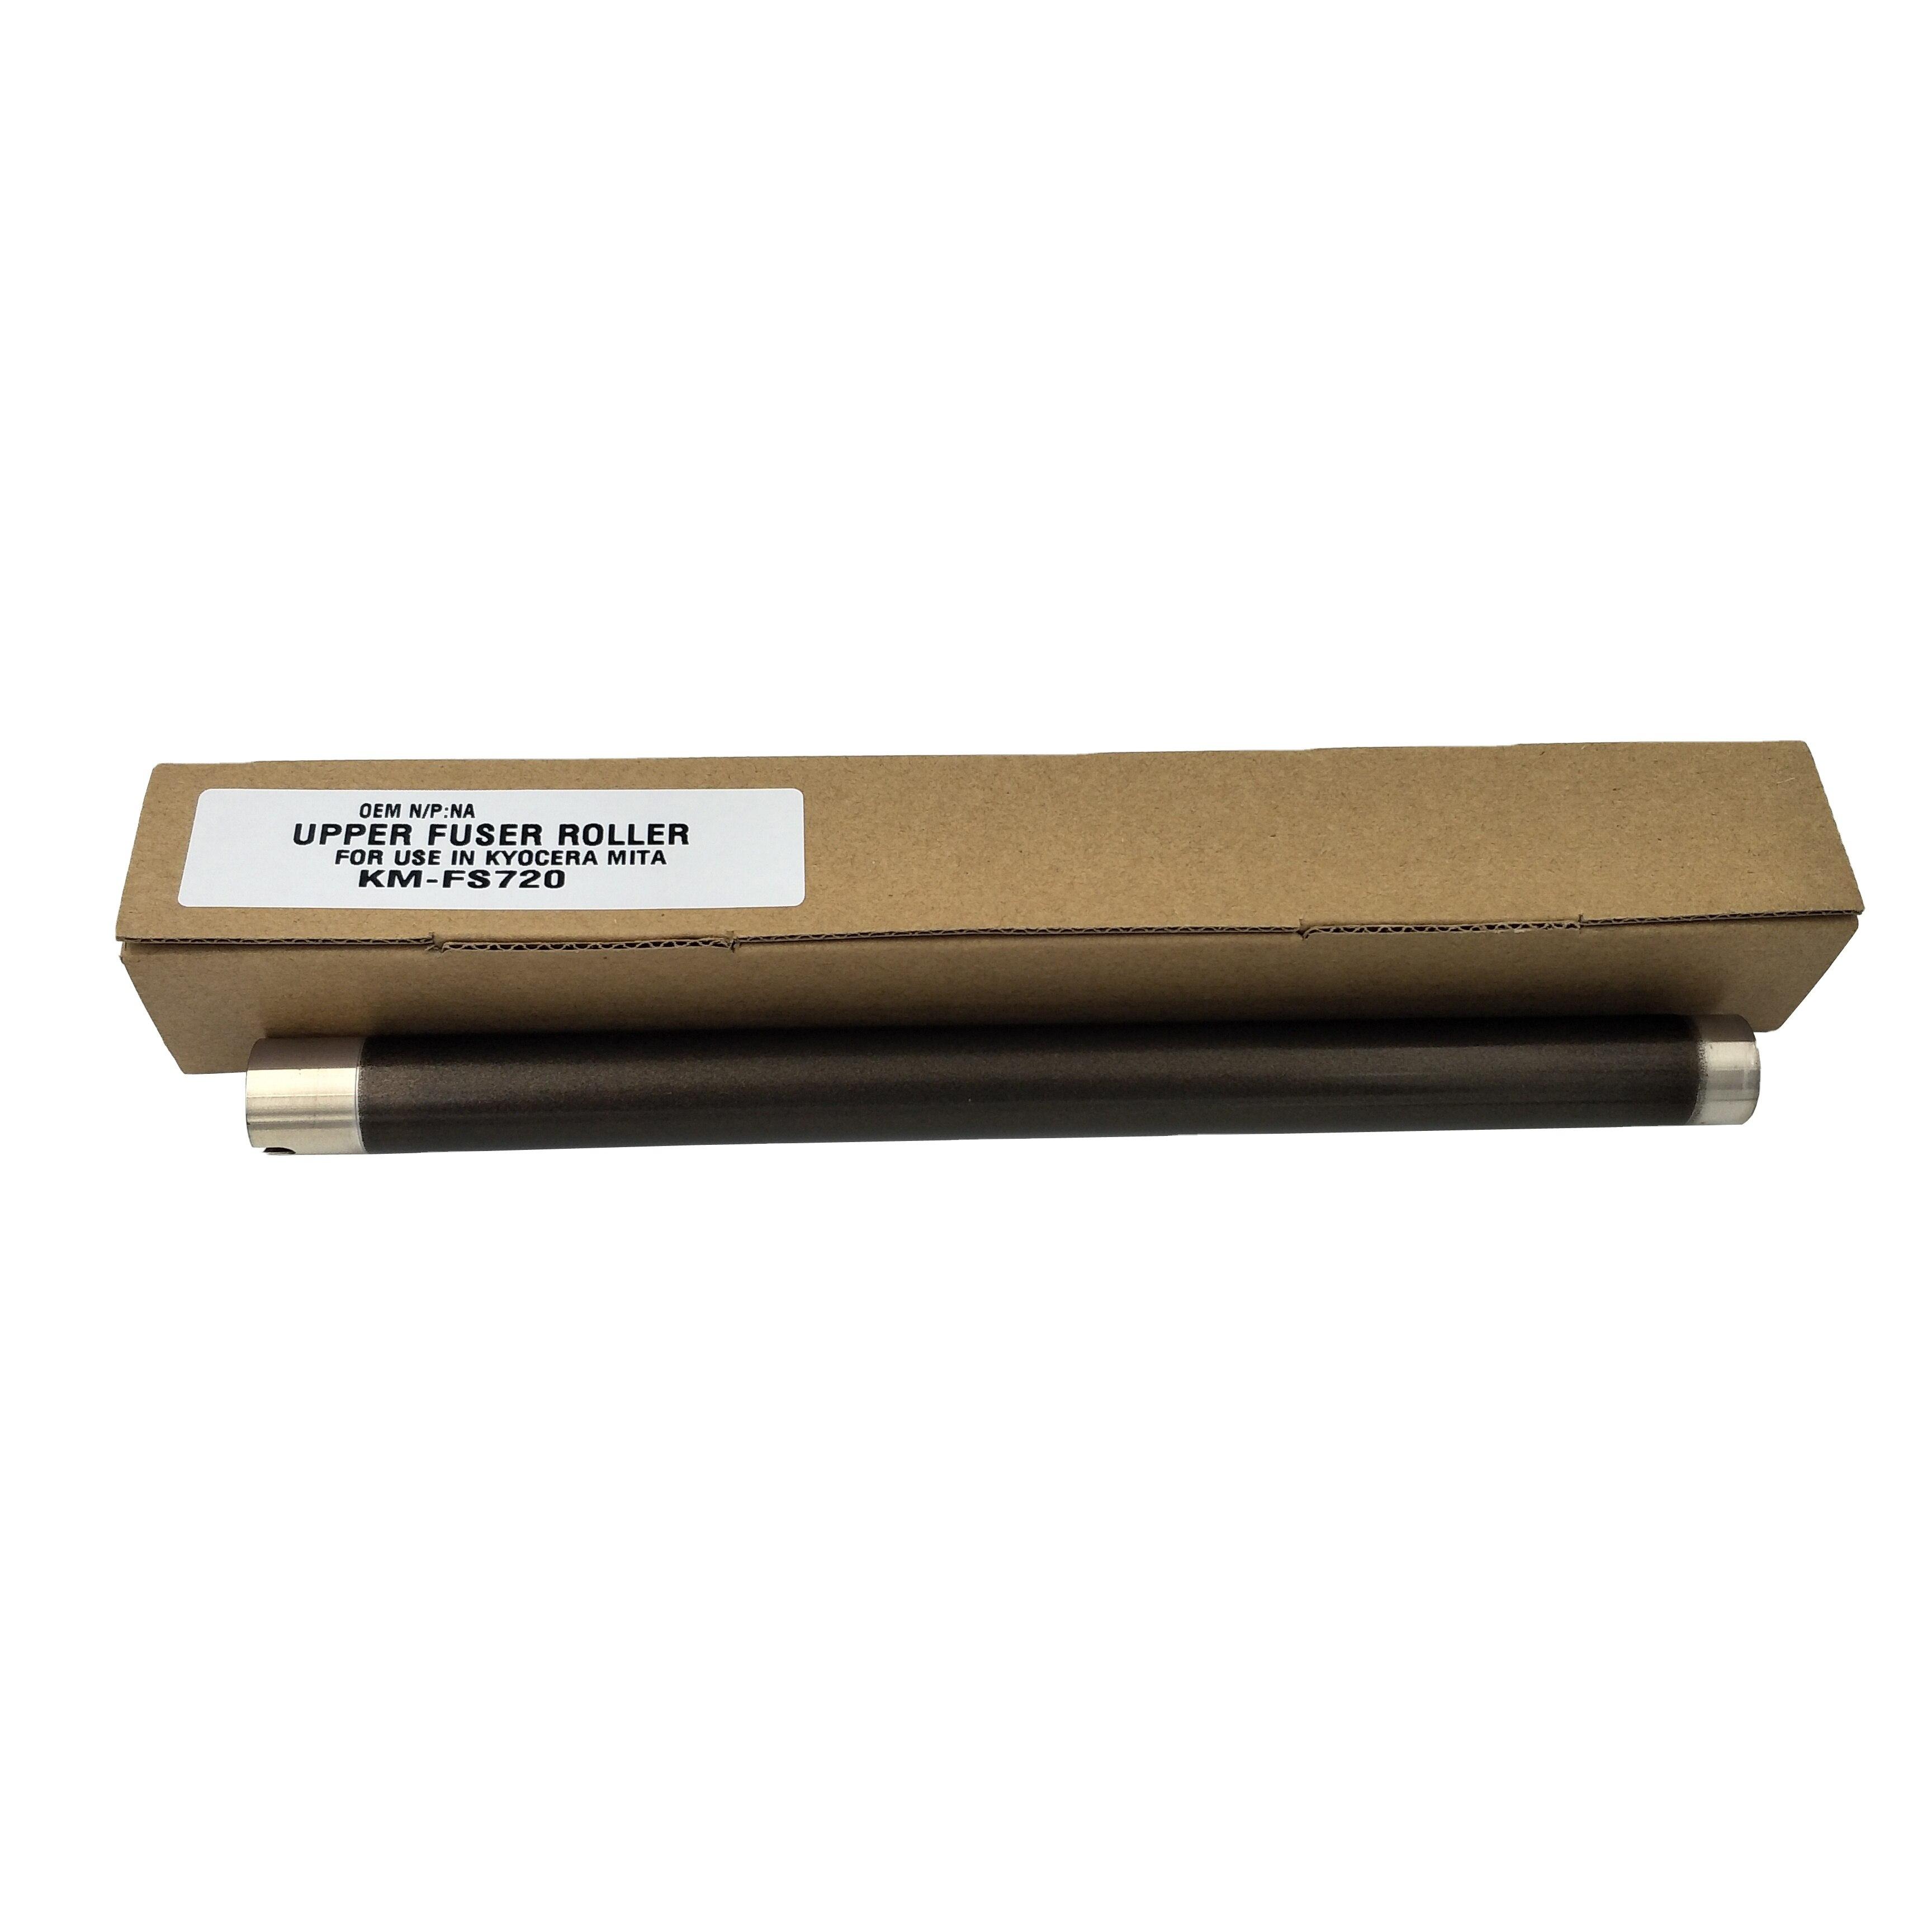 2BY20010 302FV20143 For Kyocera FS720 FS820 FS920 KM1500 KM1815 KM1820 Upper Fuser Heat Roller